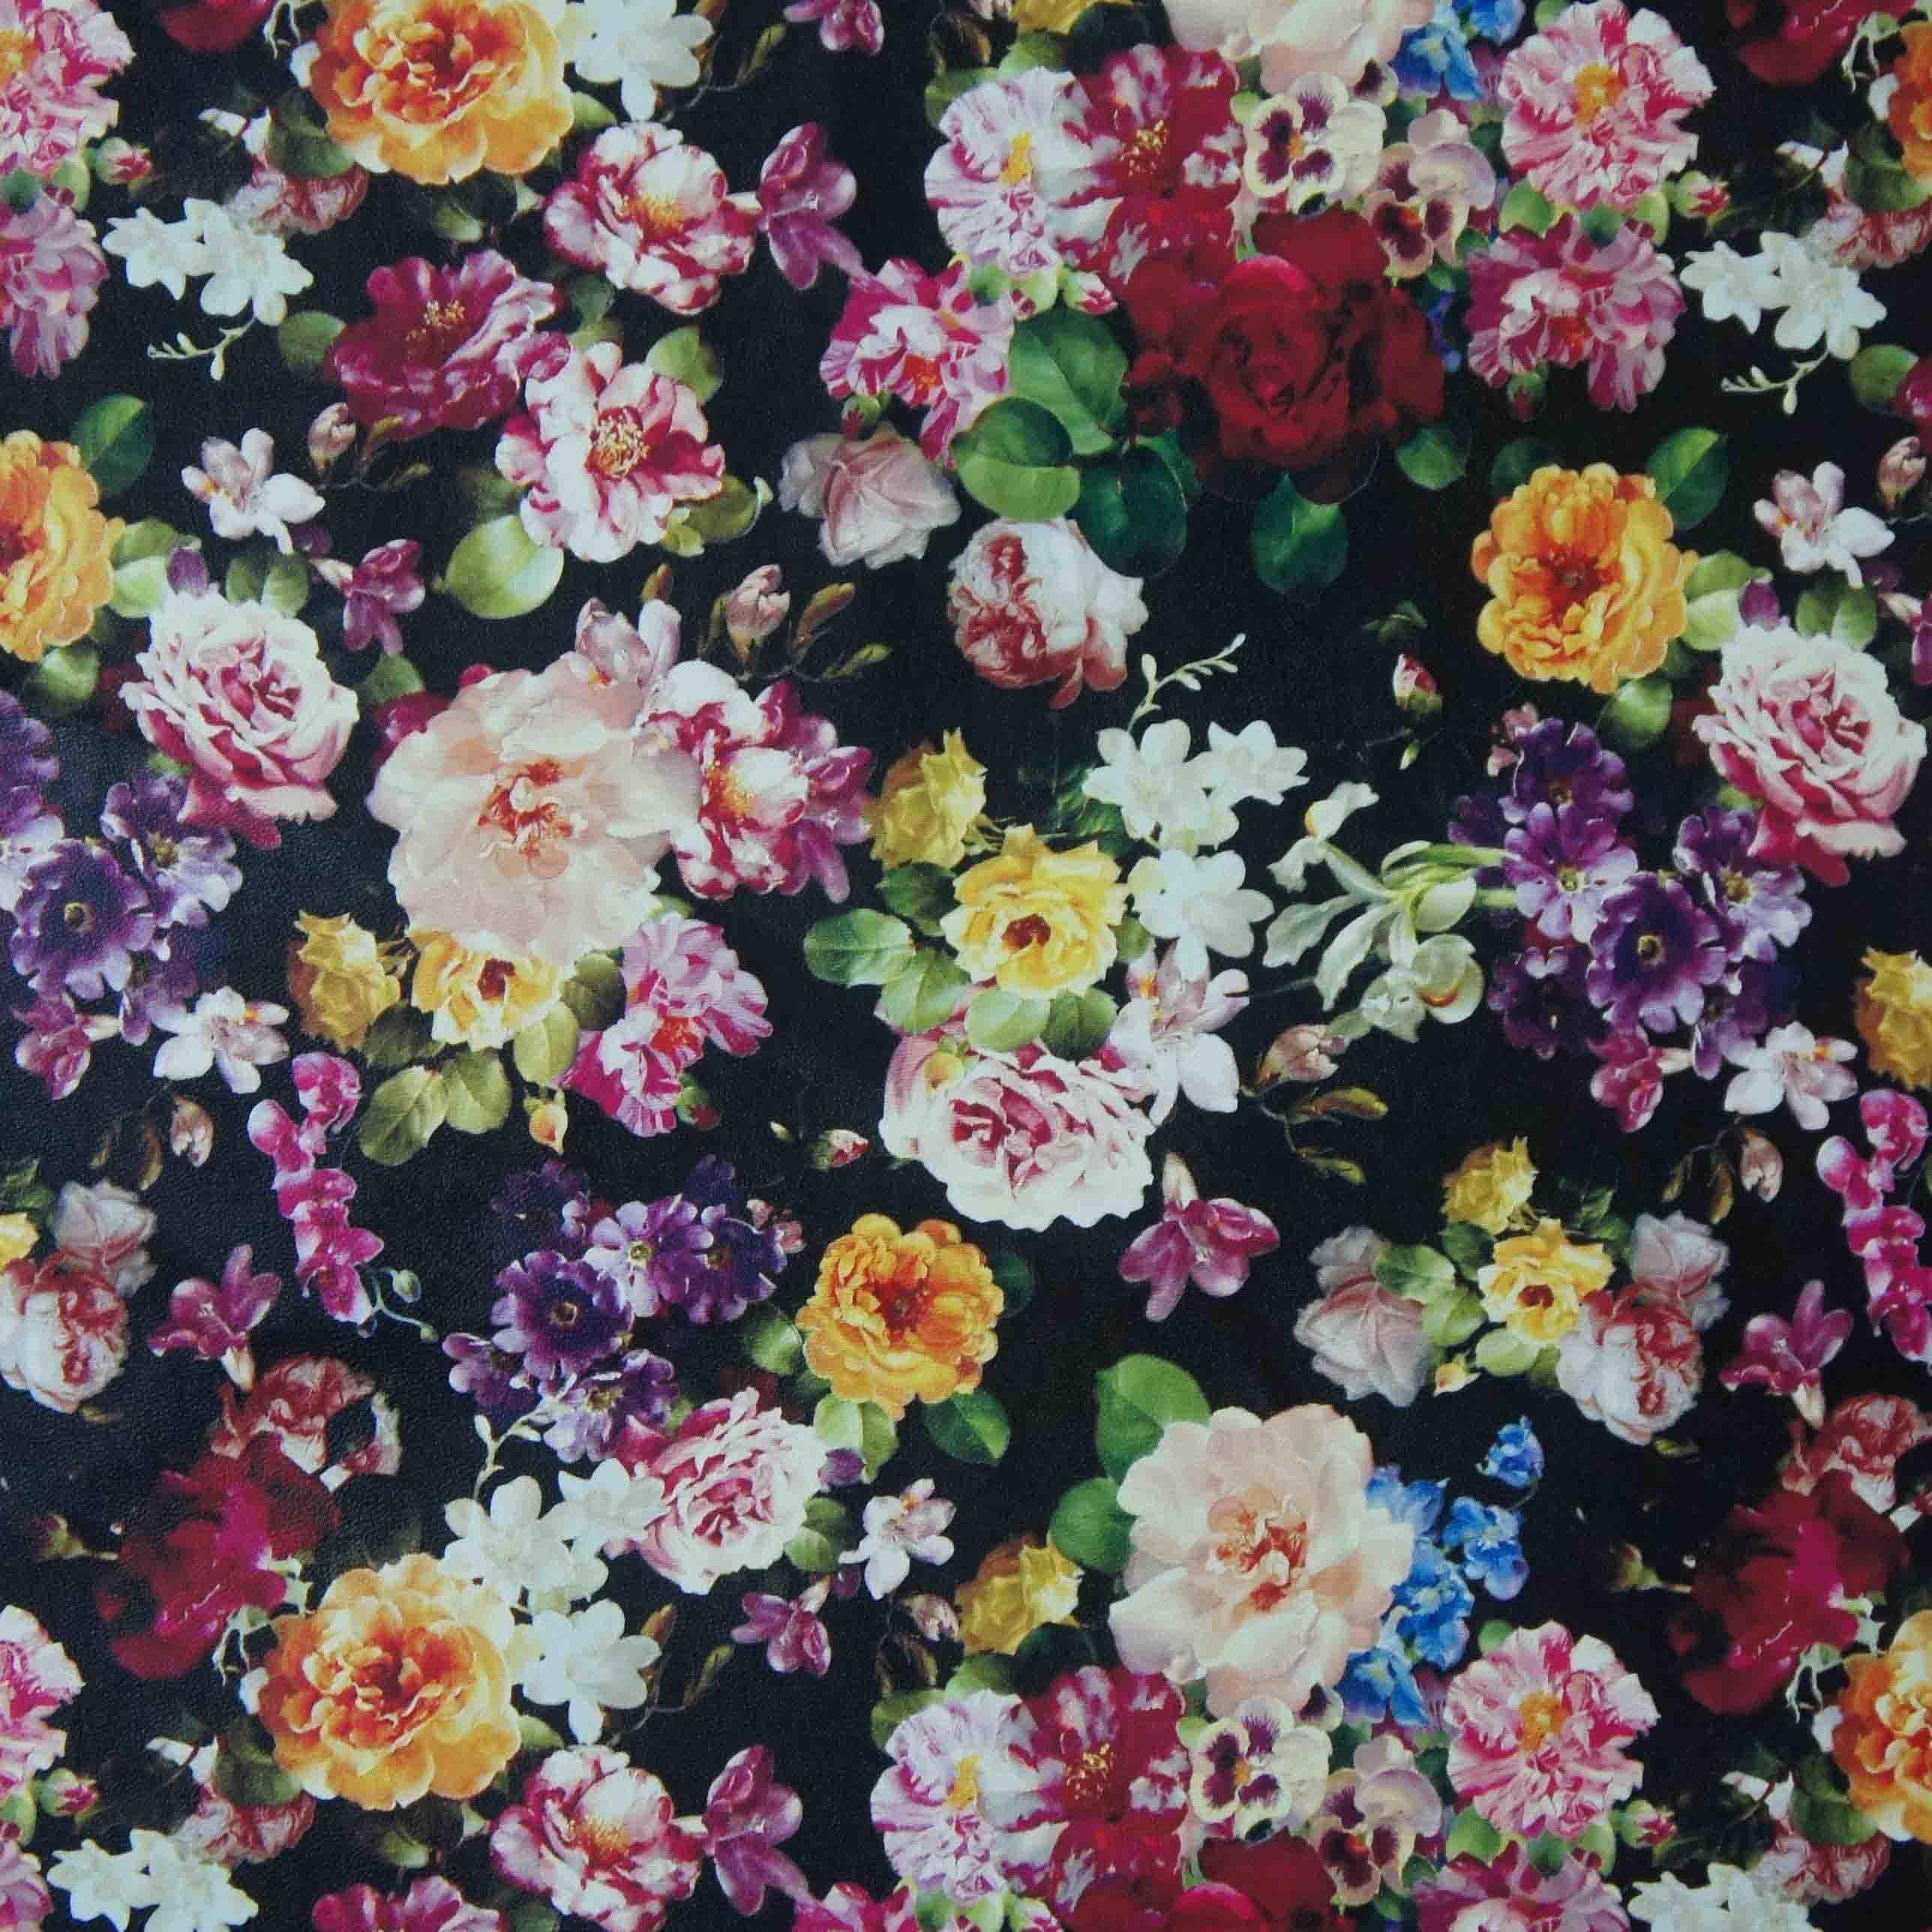 Oxford 600d High Density PVC/PU Flower Printing Polyester Fabric (XLT-FL)